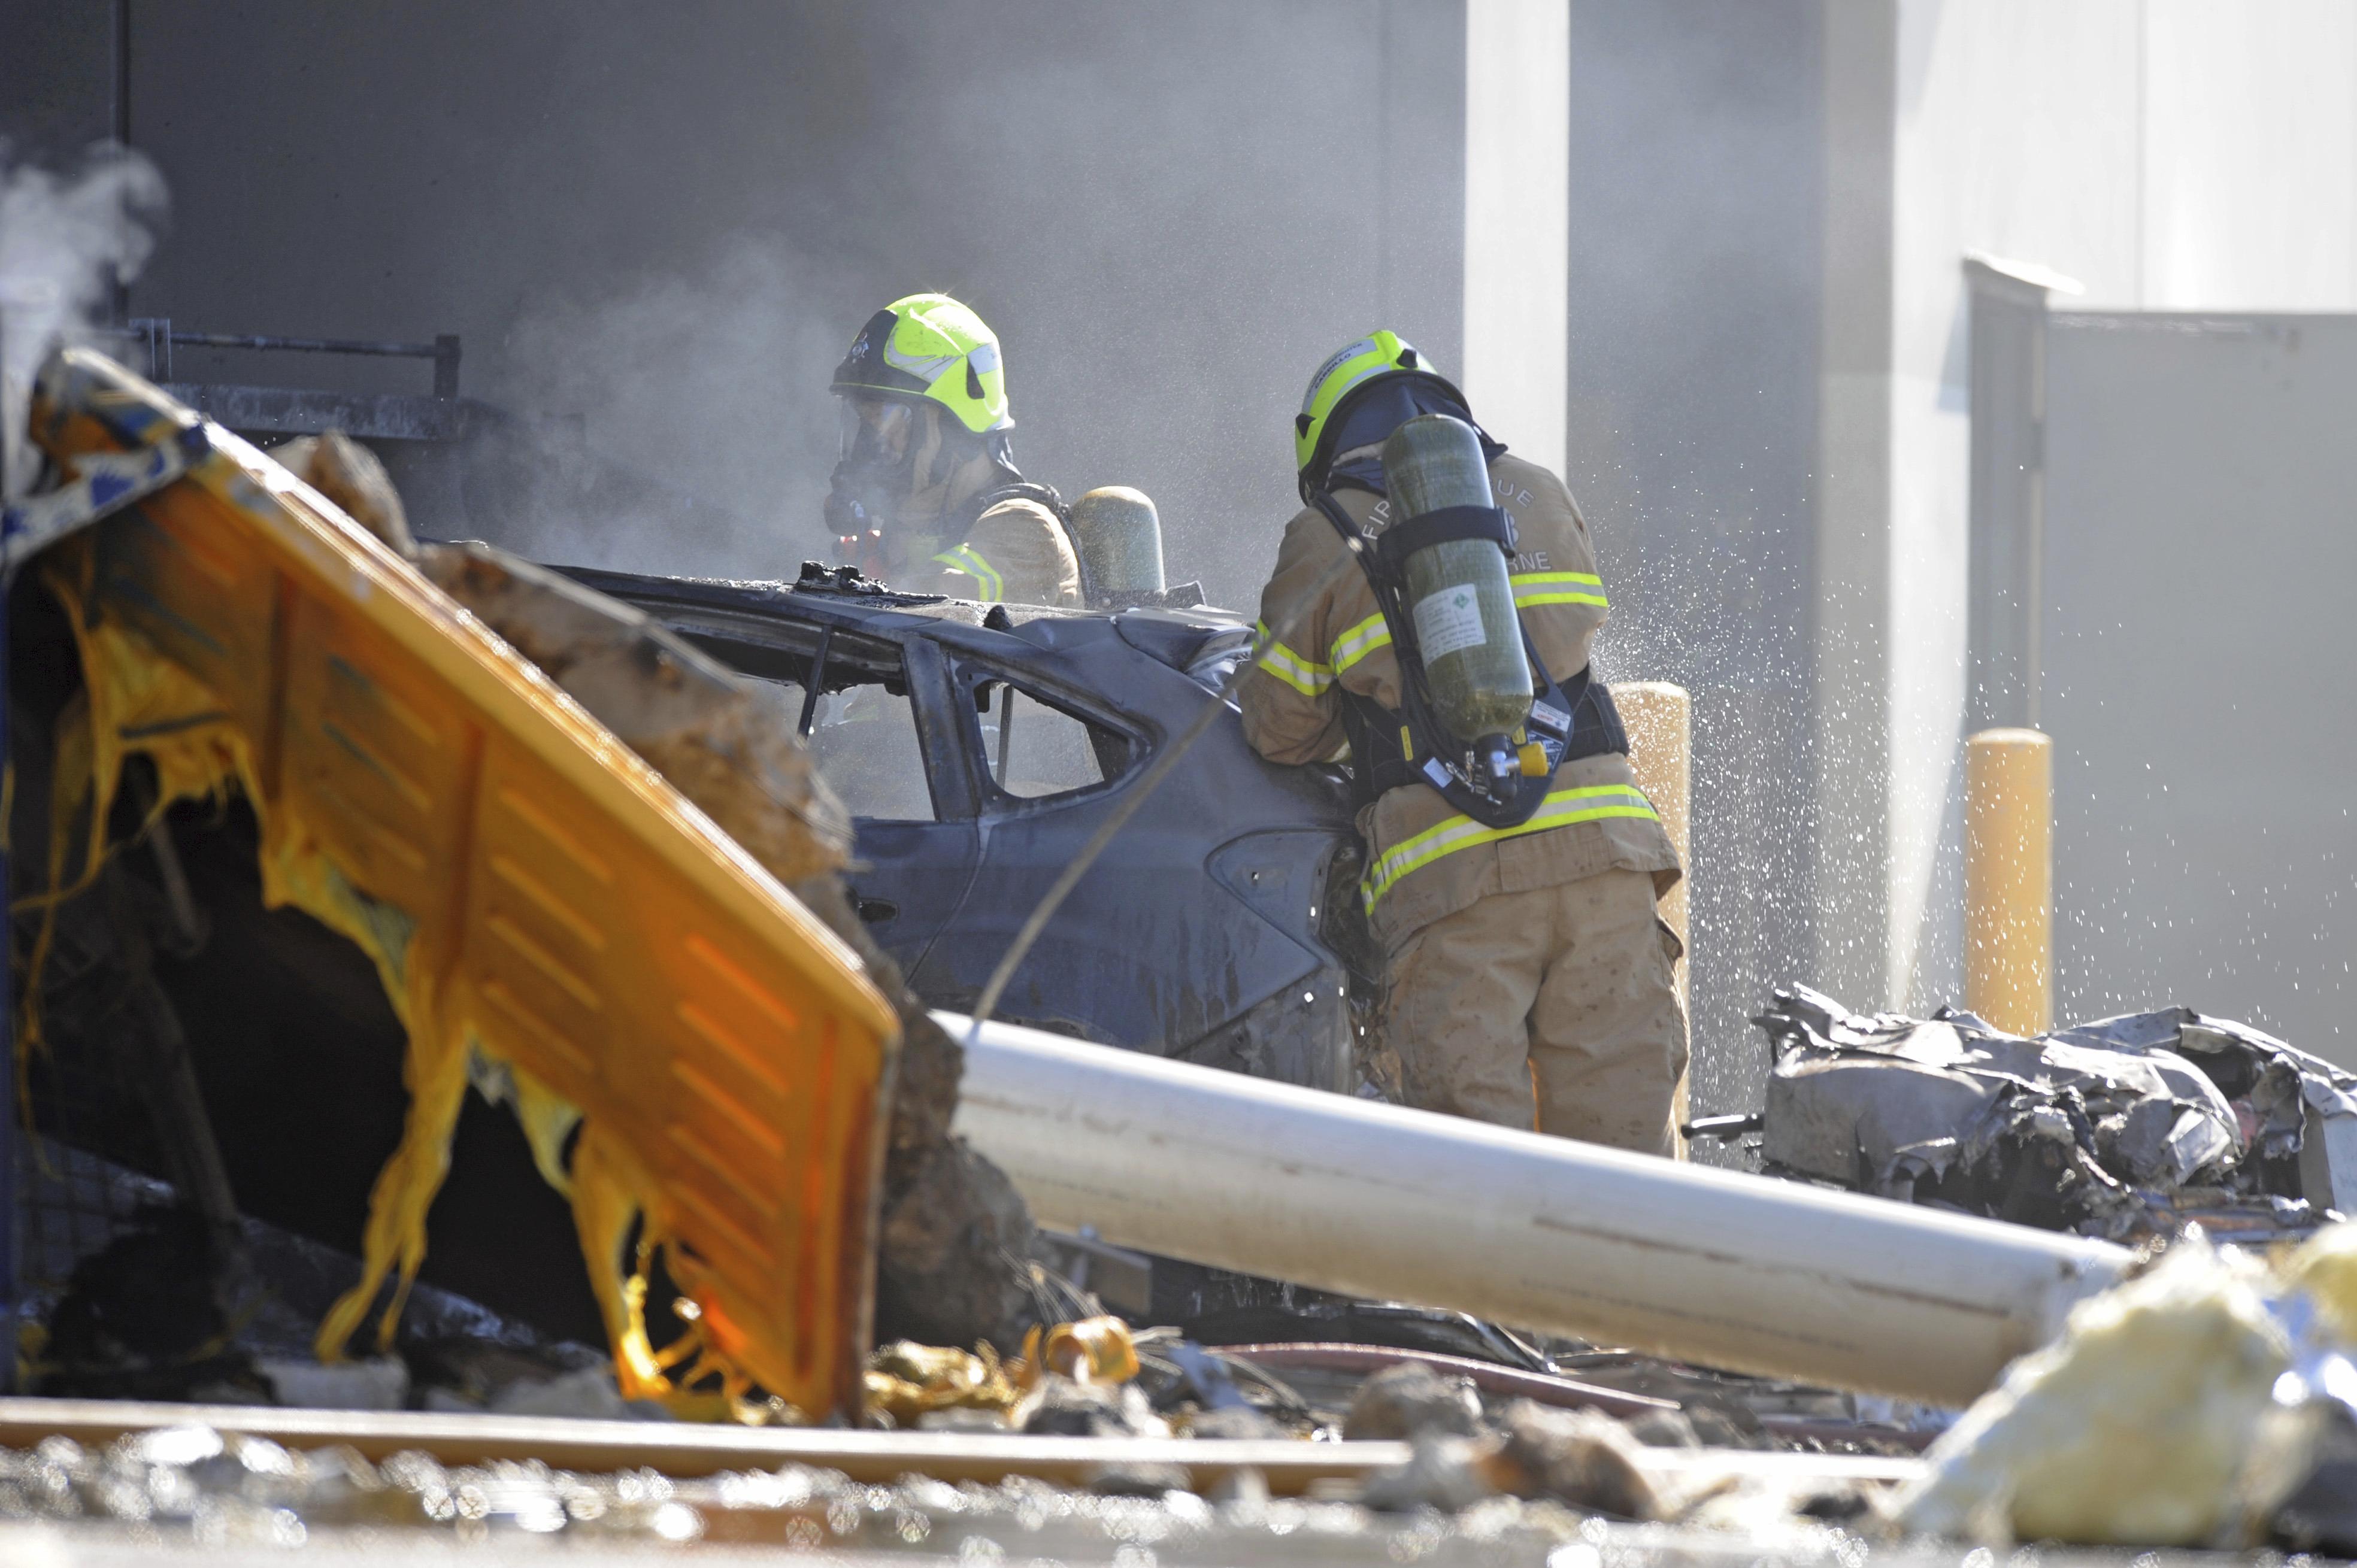 Emergency personnel work at a light plane crashed in Melbourne, Australia on Feb. 21, 2017. (Joe Castro/AAP Image via AP)